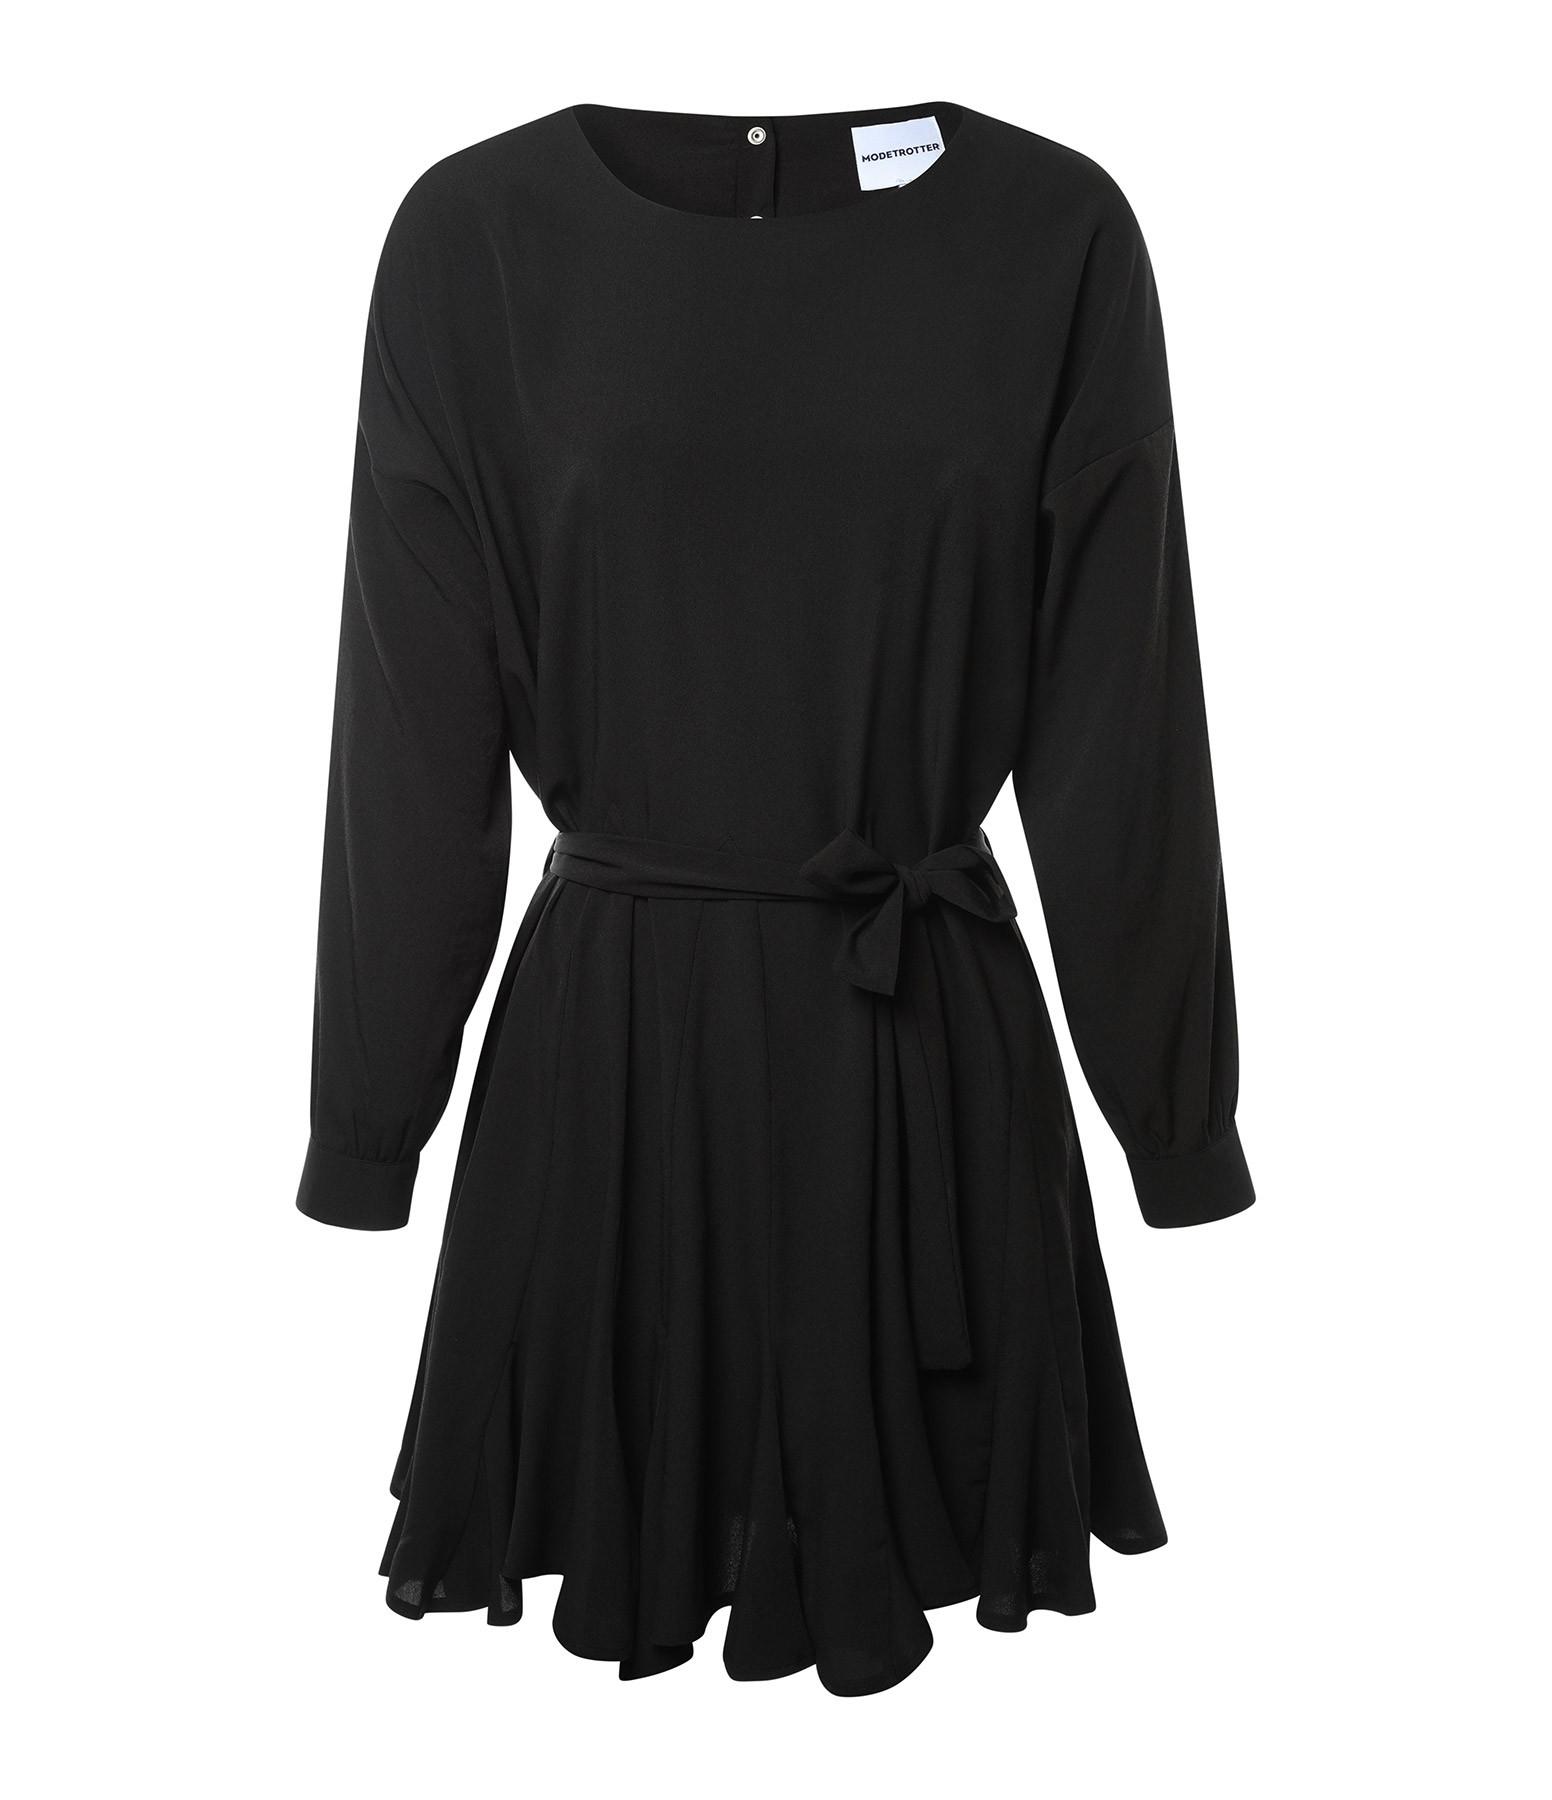 MODETROTTER - Robe Colette Noir